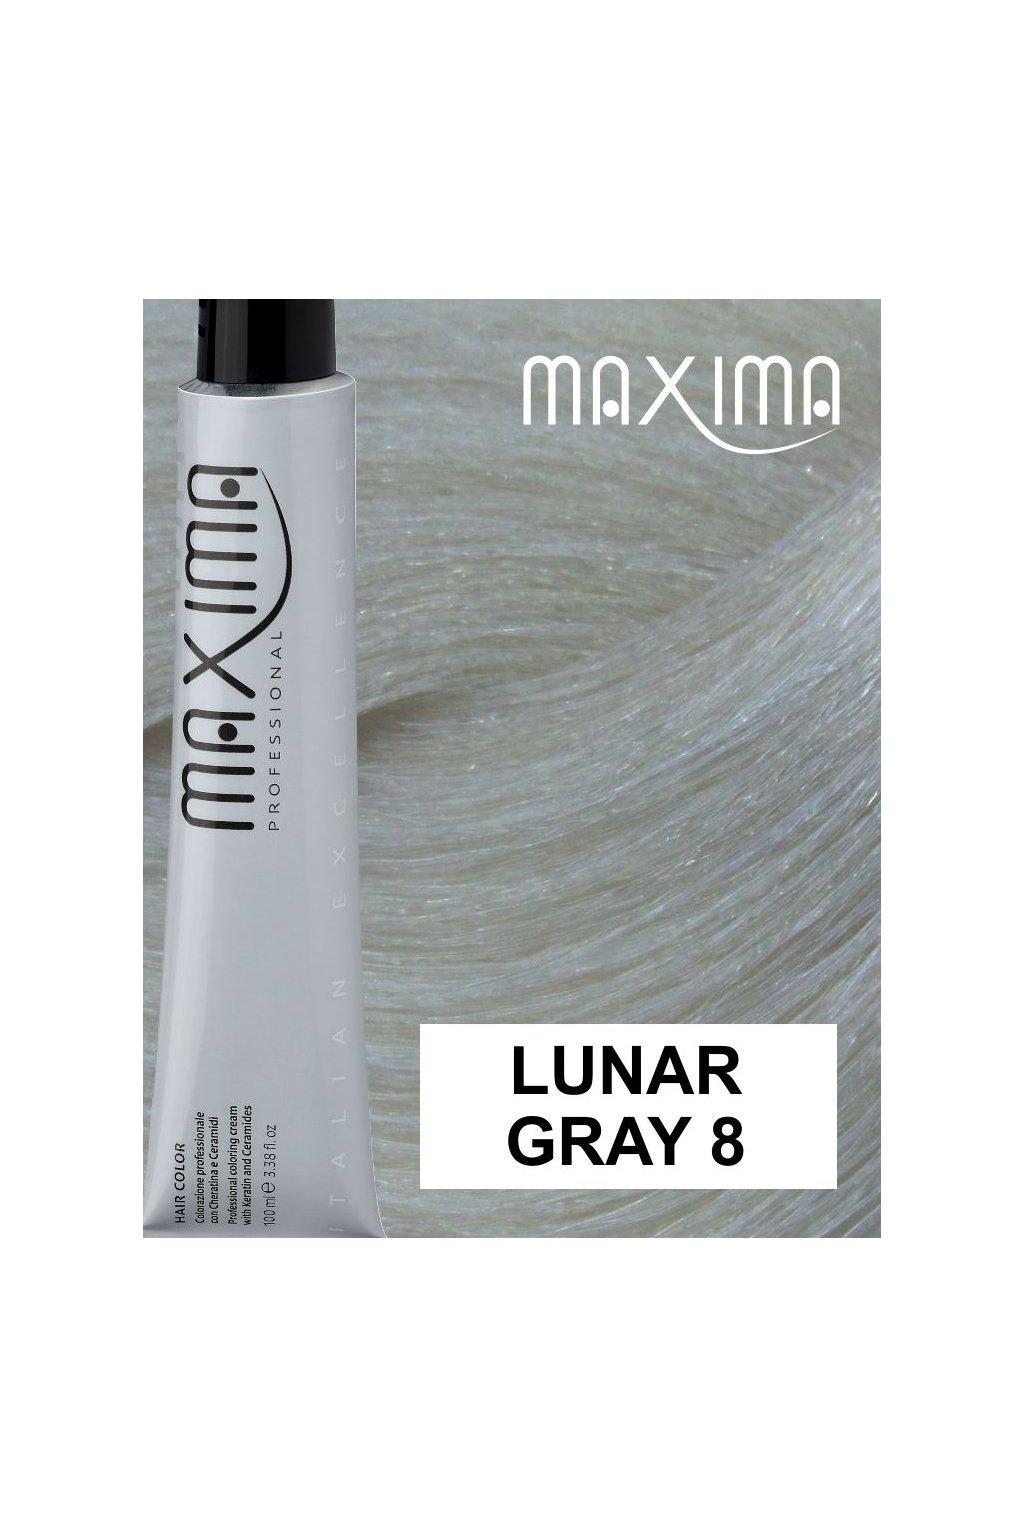 LUNAR GRAY 8 max